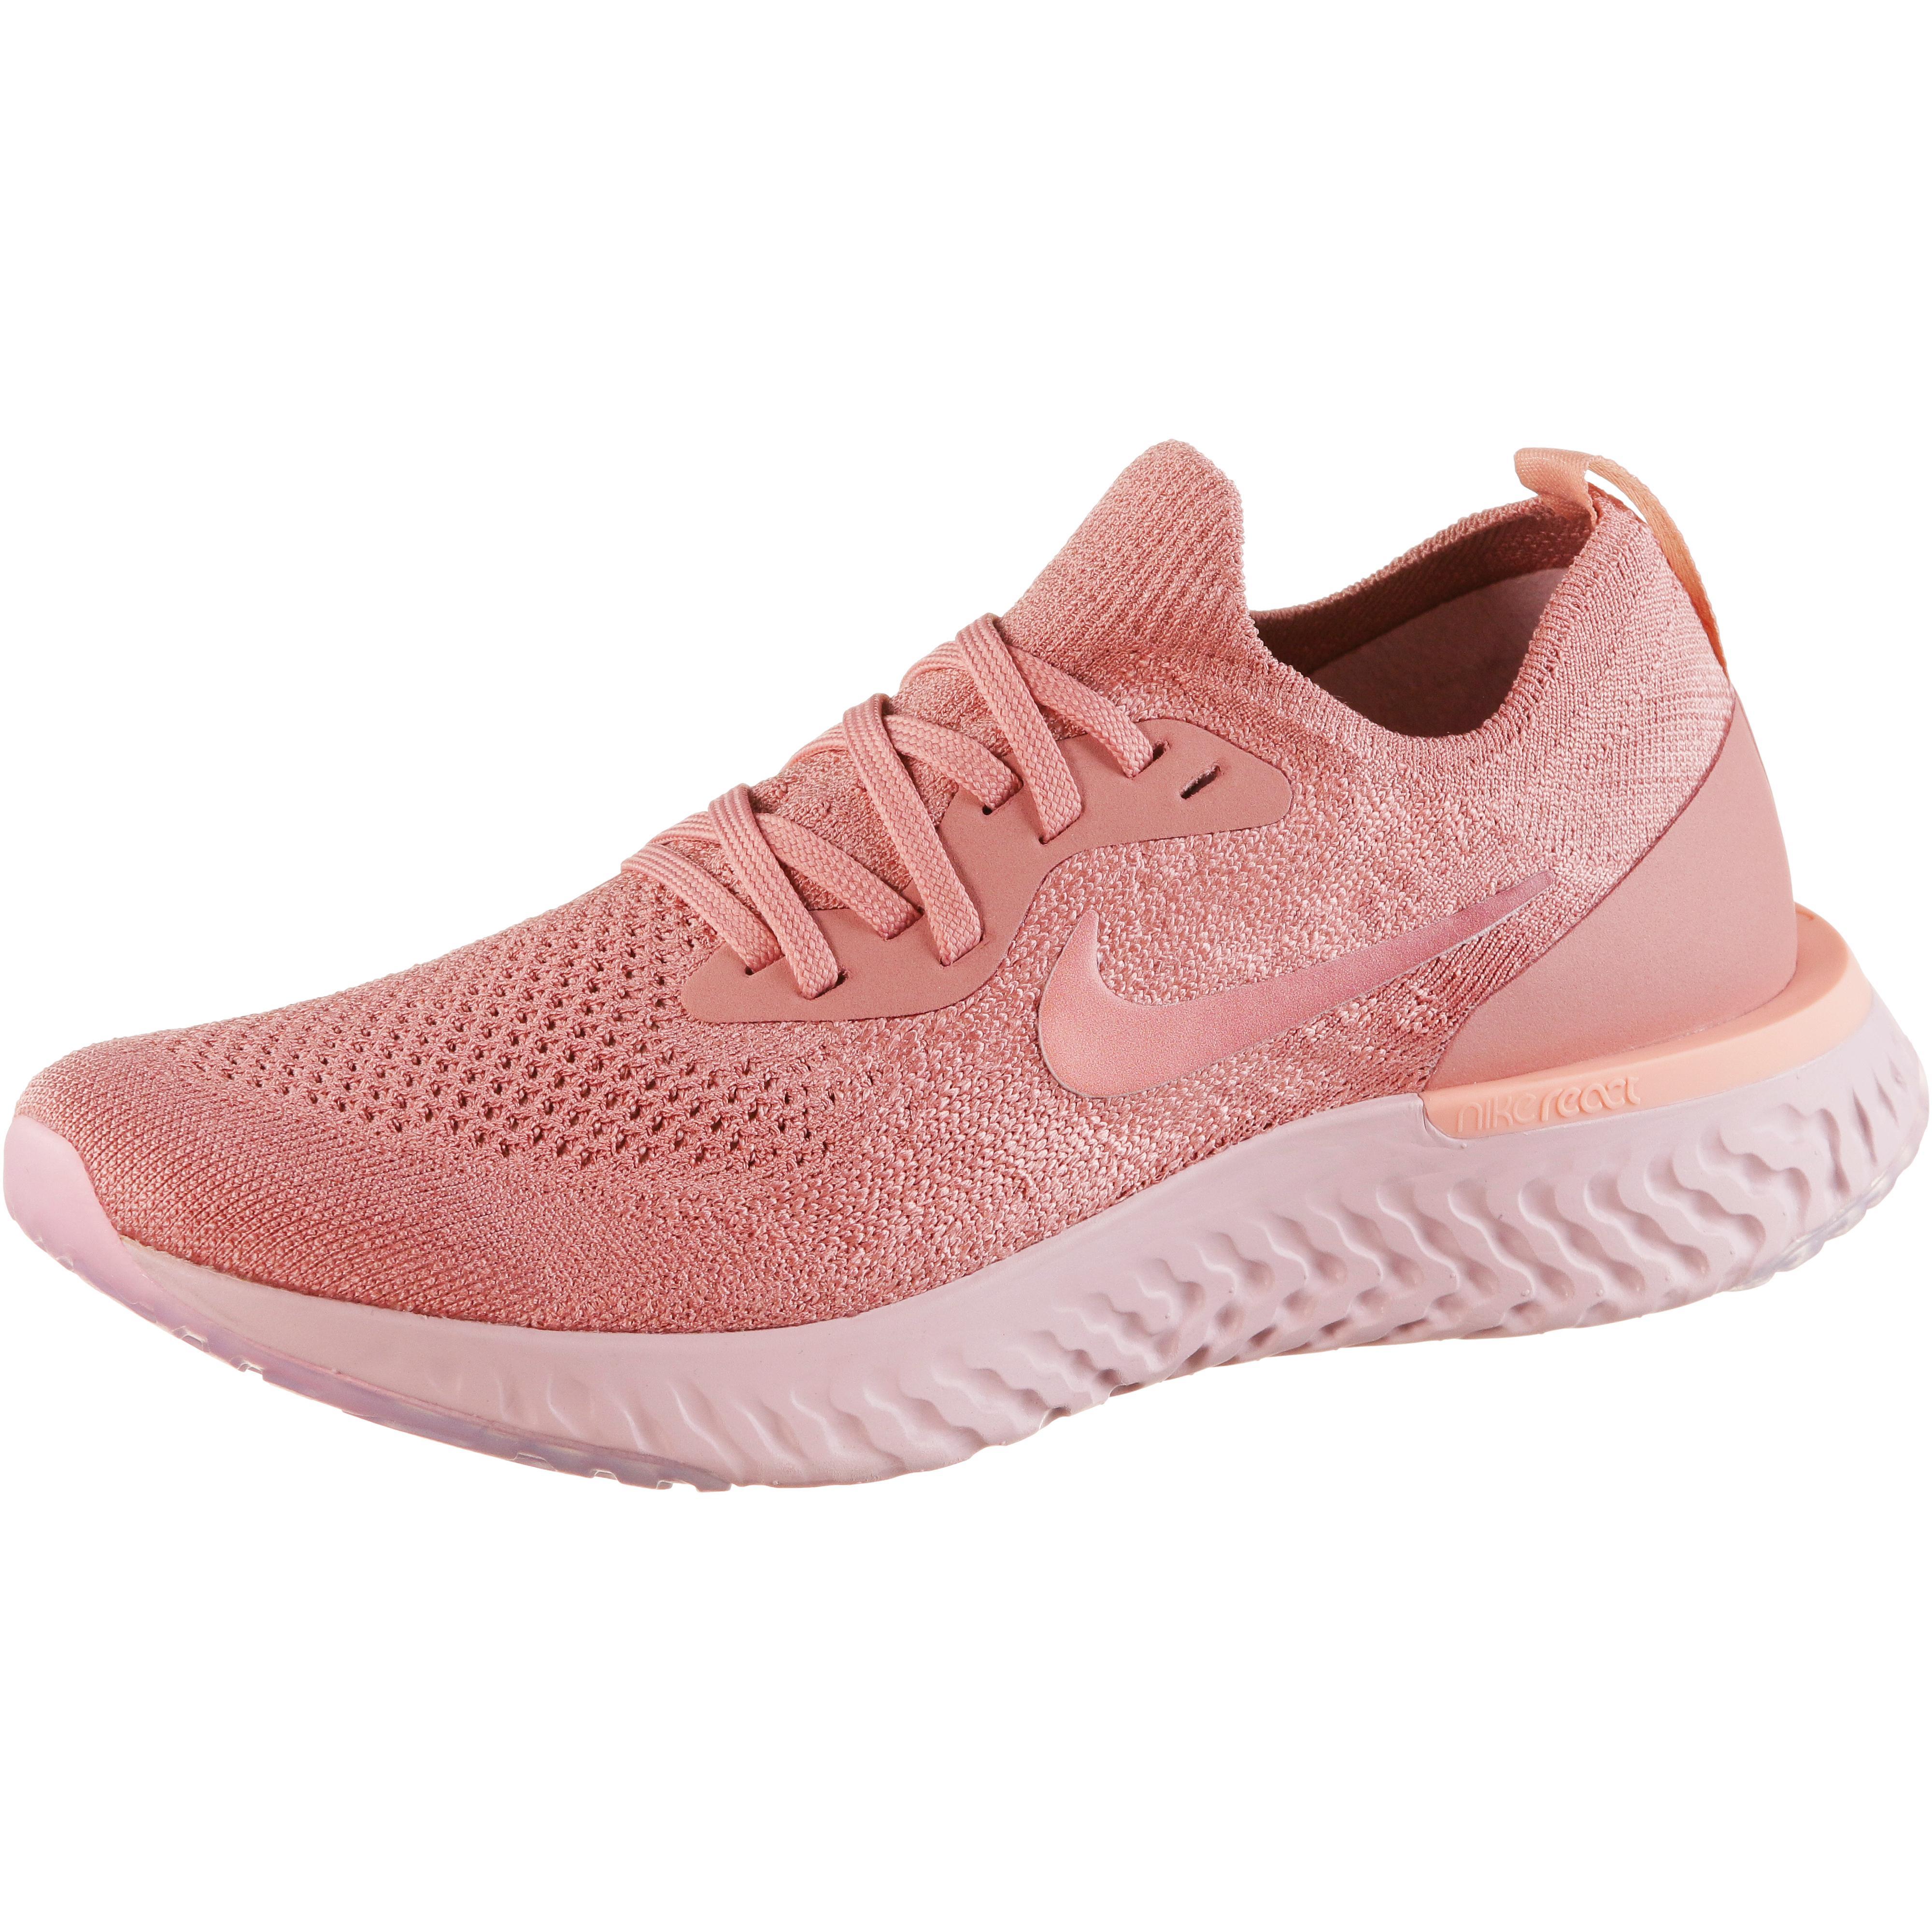 Nike Epic React Flyknit Laufschuhe Damen  rust-pink-pink-tint-tropical-pink-barely-rose im Online Shop von  SportScheck kaufen